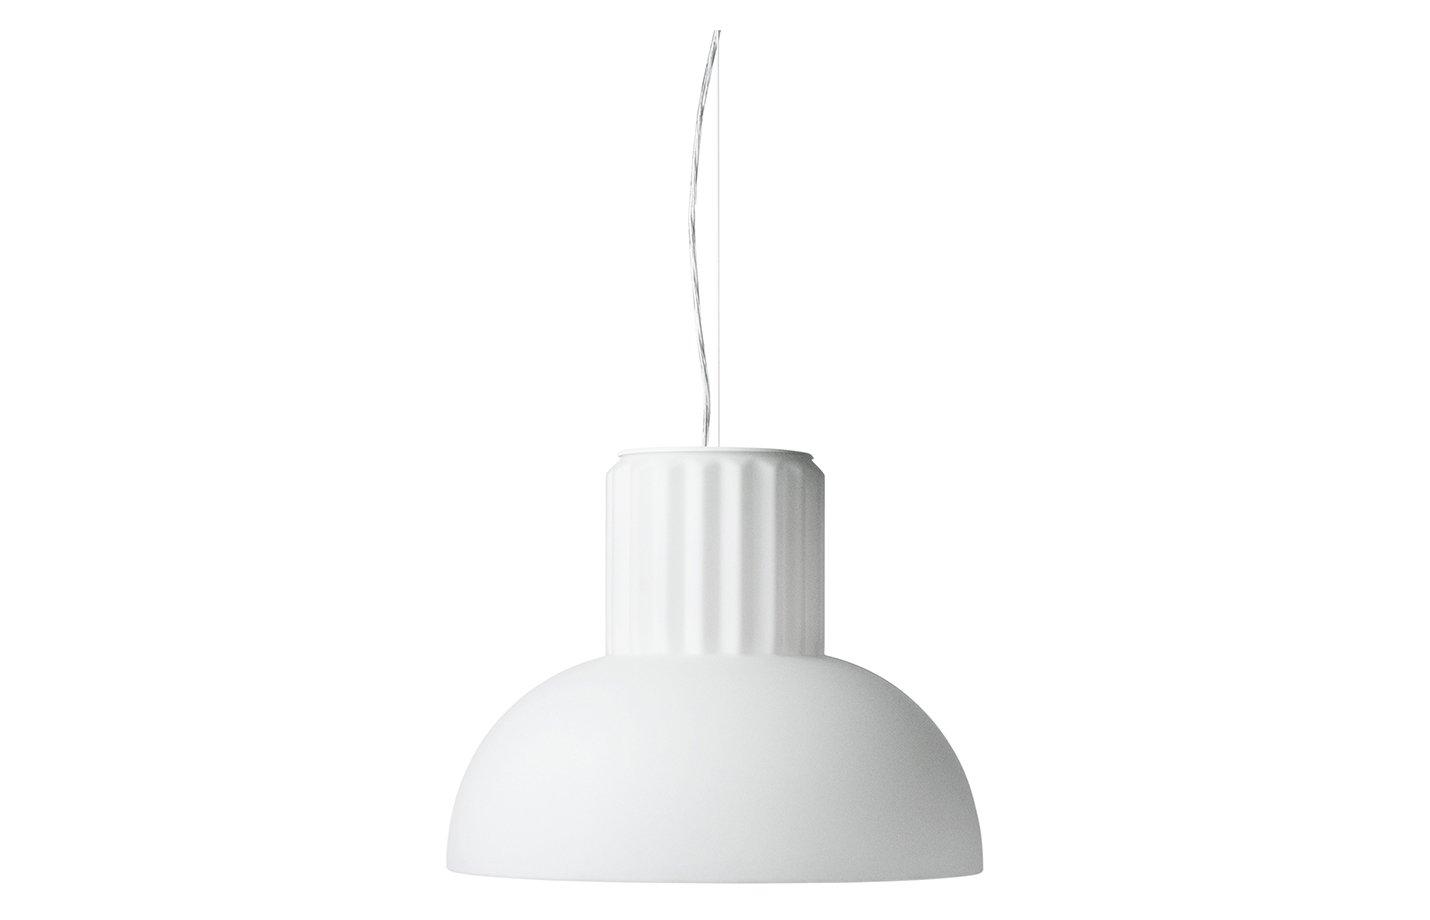 The standard pendant lamp – white